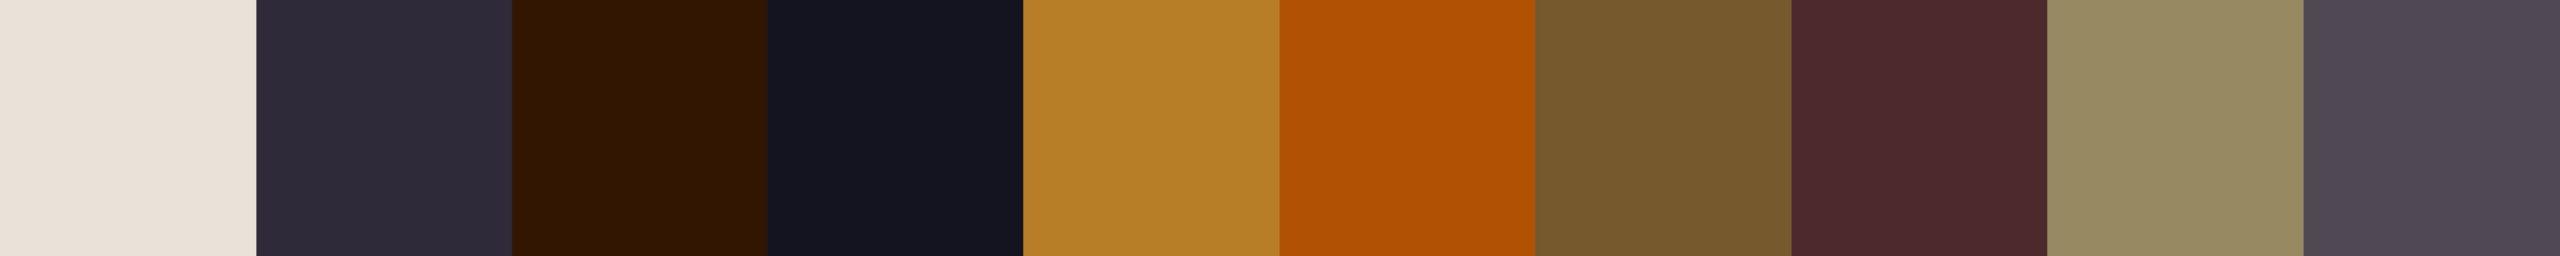 627 Krobusma Color Palette